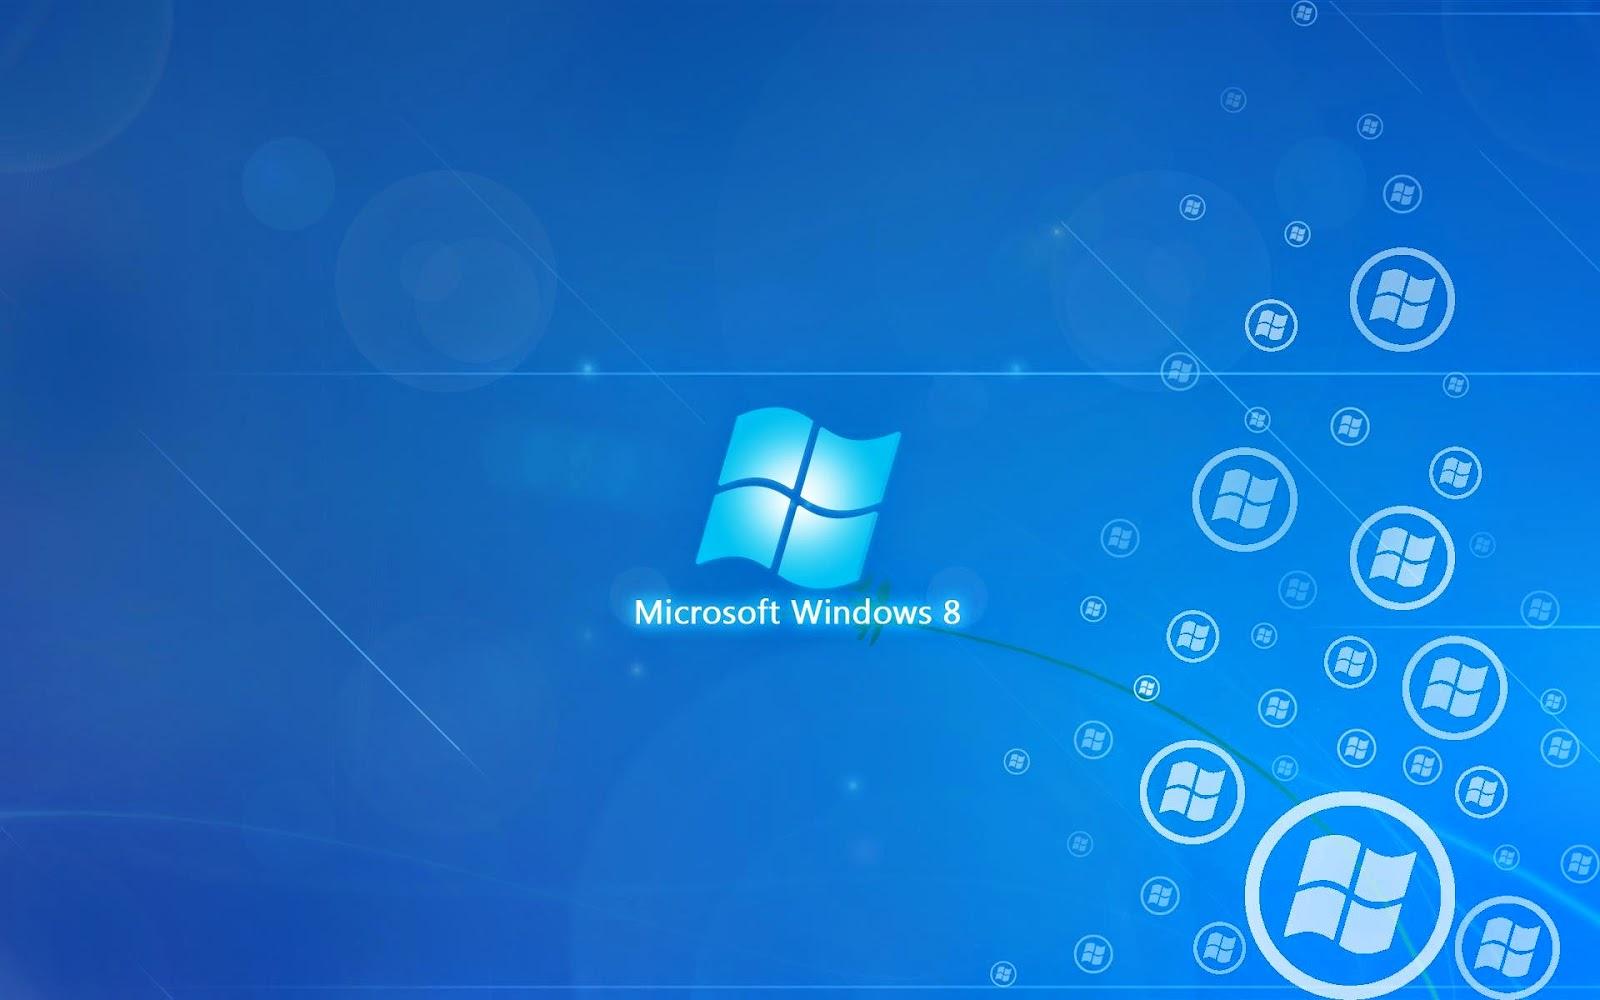 windows-8 wallpaper-full-HD-1080p-desktop-pc-laptop-free-download.jpg